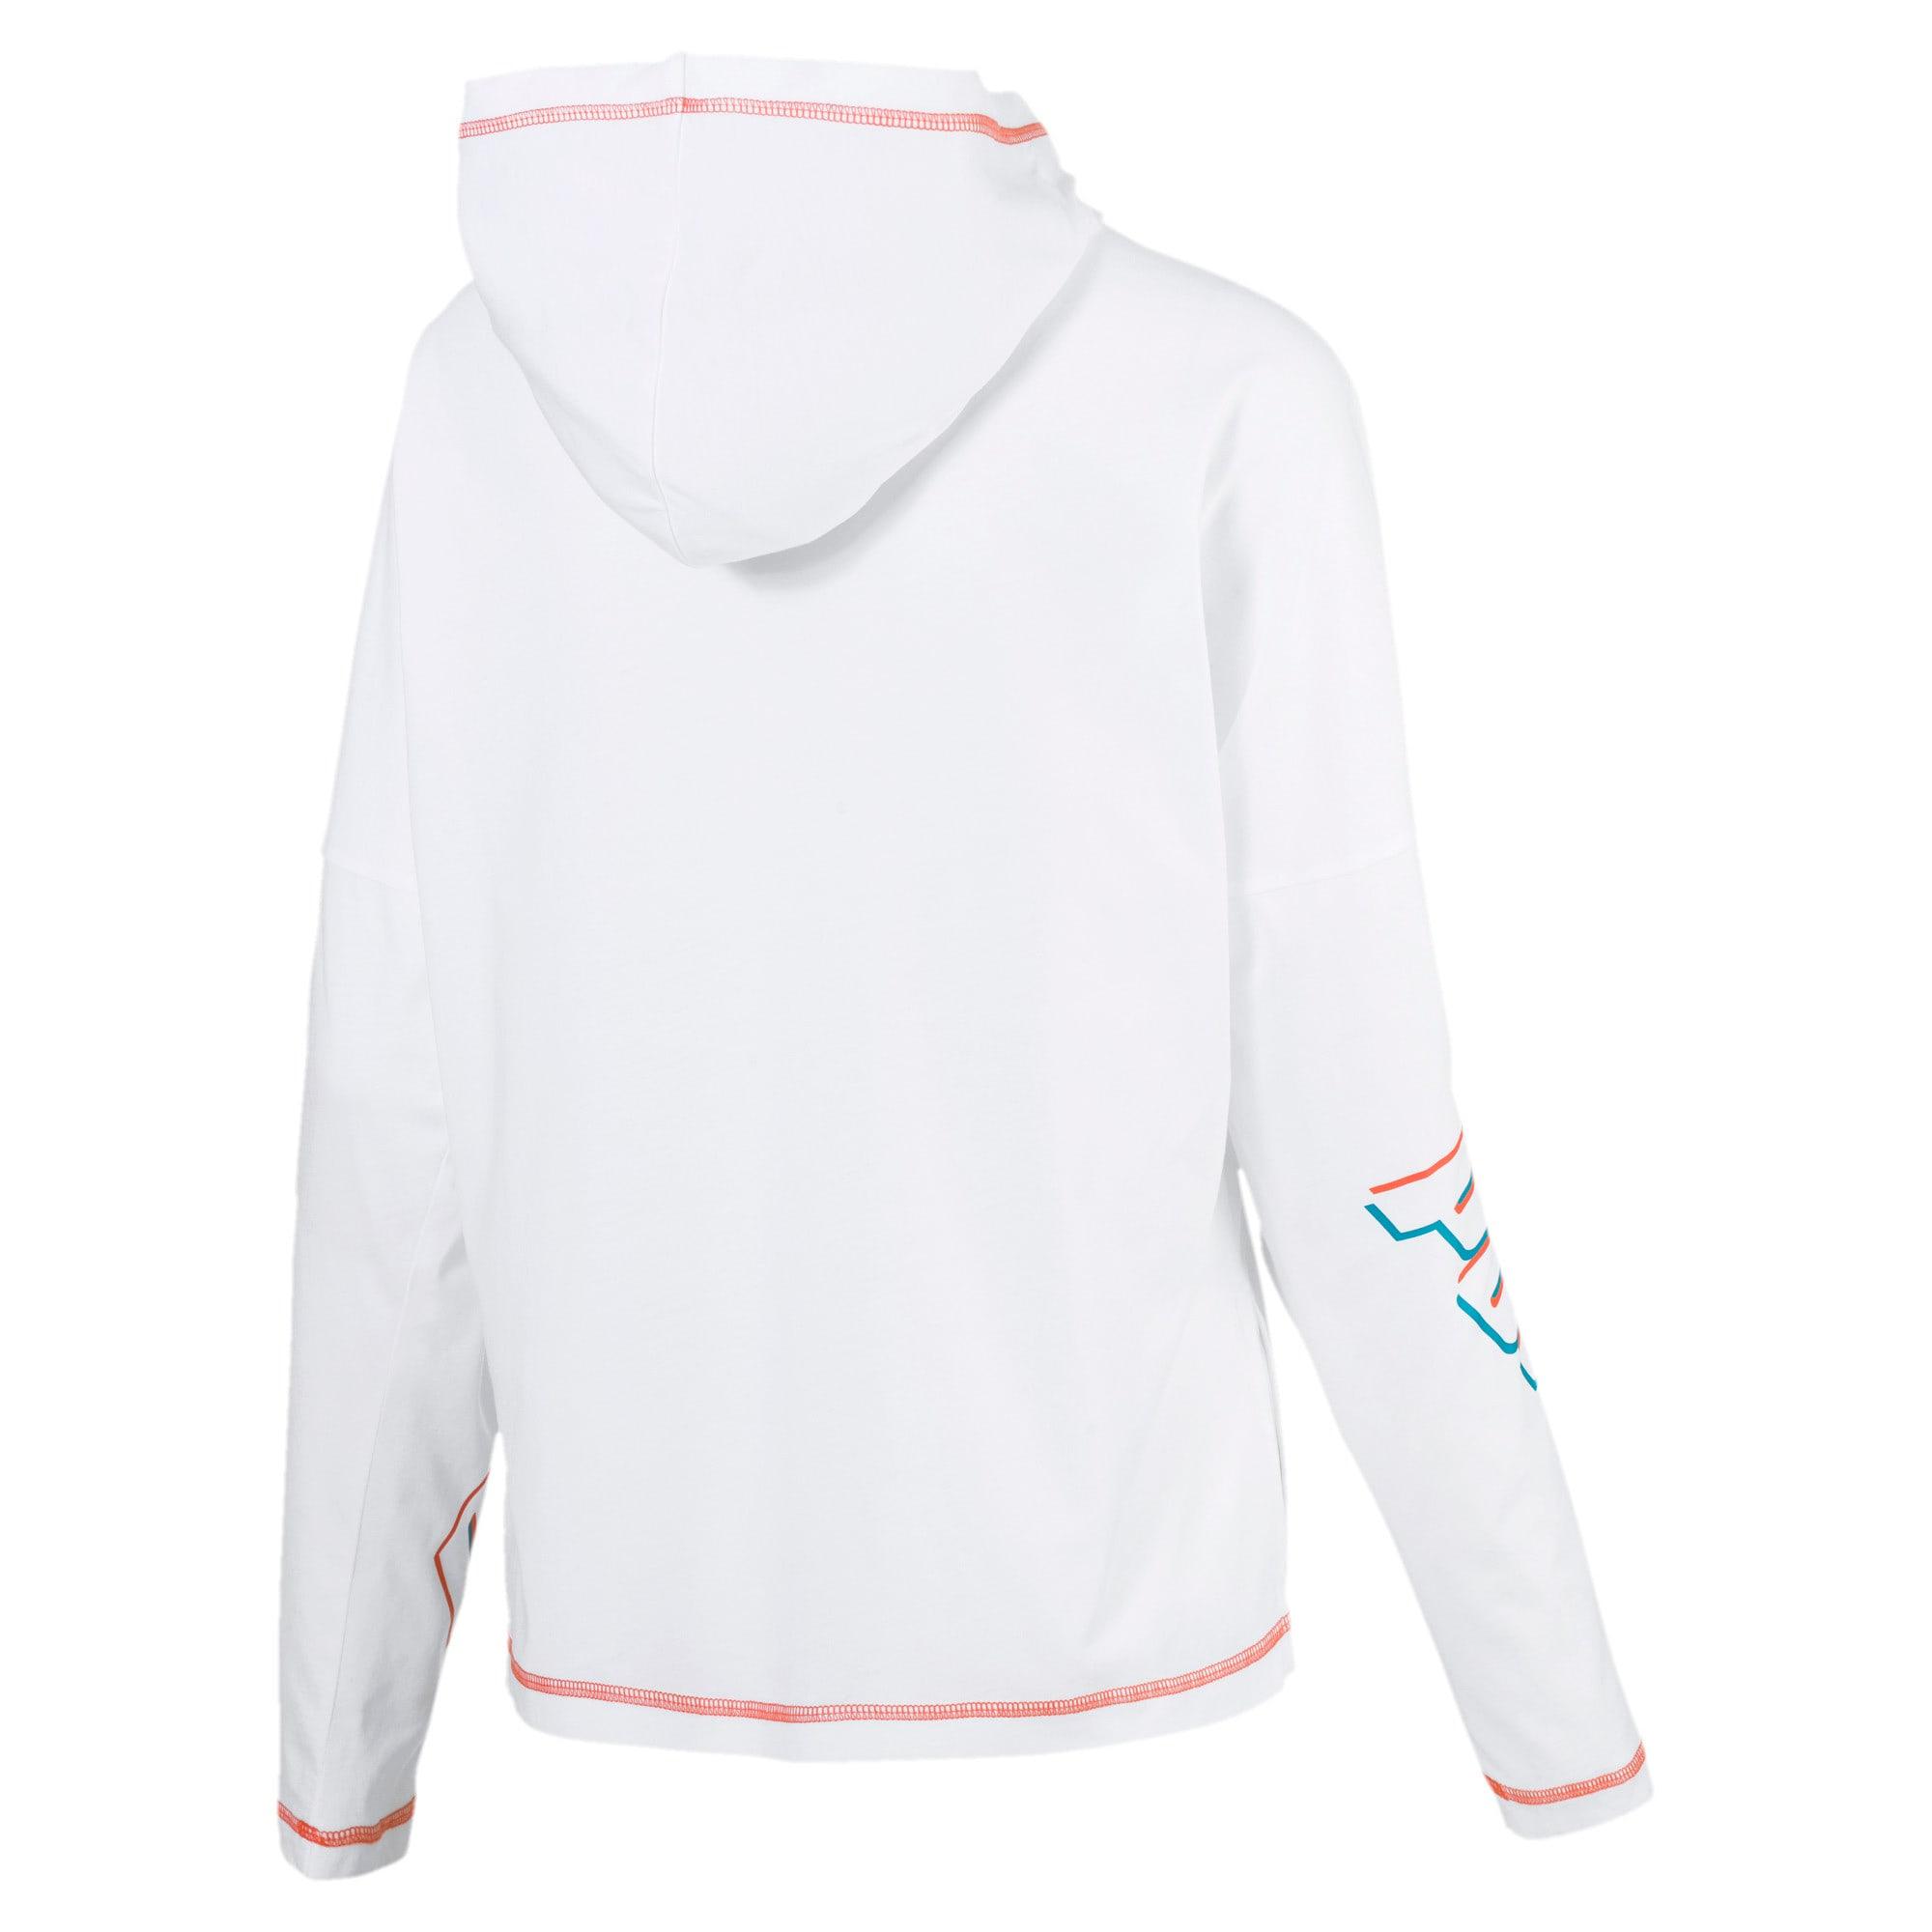 Miniatura 3 de Top liviano Modern Sports para mujer, Puma White, mediano